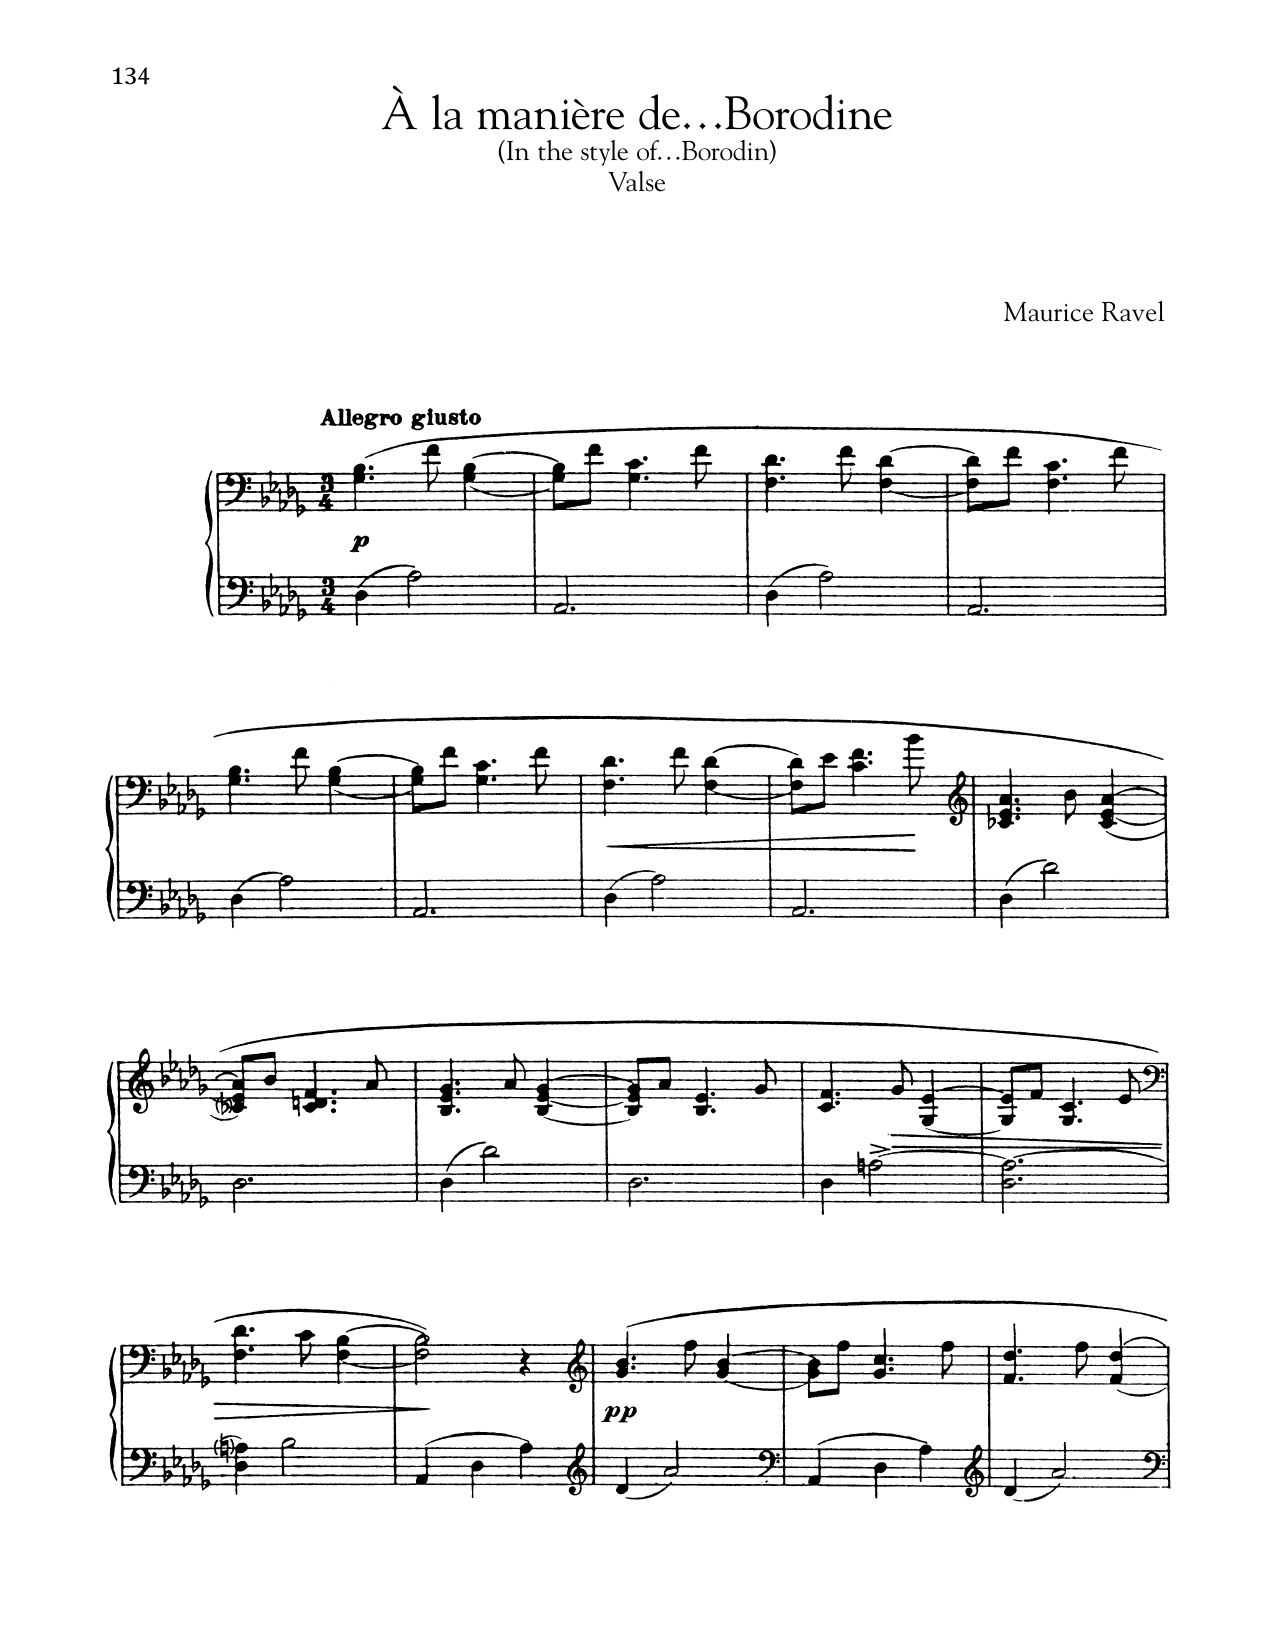 Maurice Ravel A La Maniere De Borodine (Valse) sheet music notes and chords. Download Printable PDF.